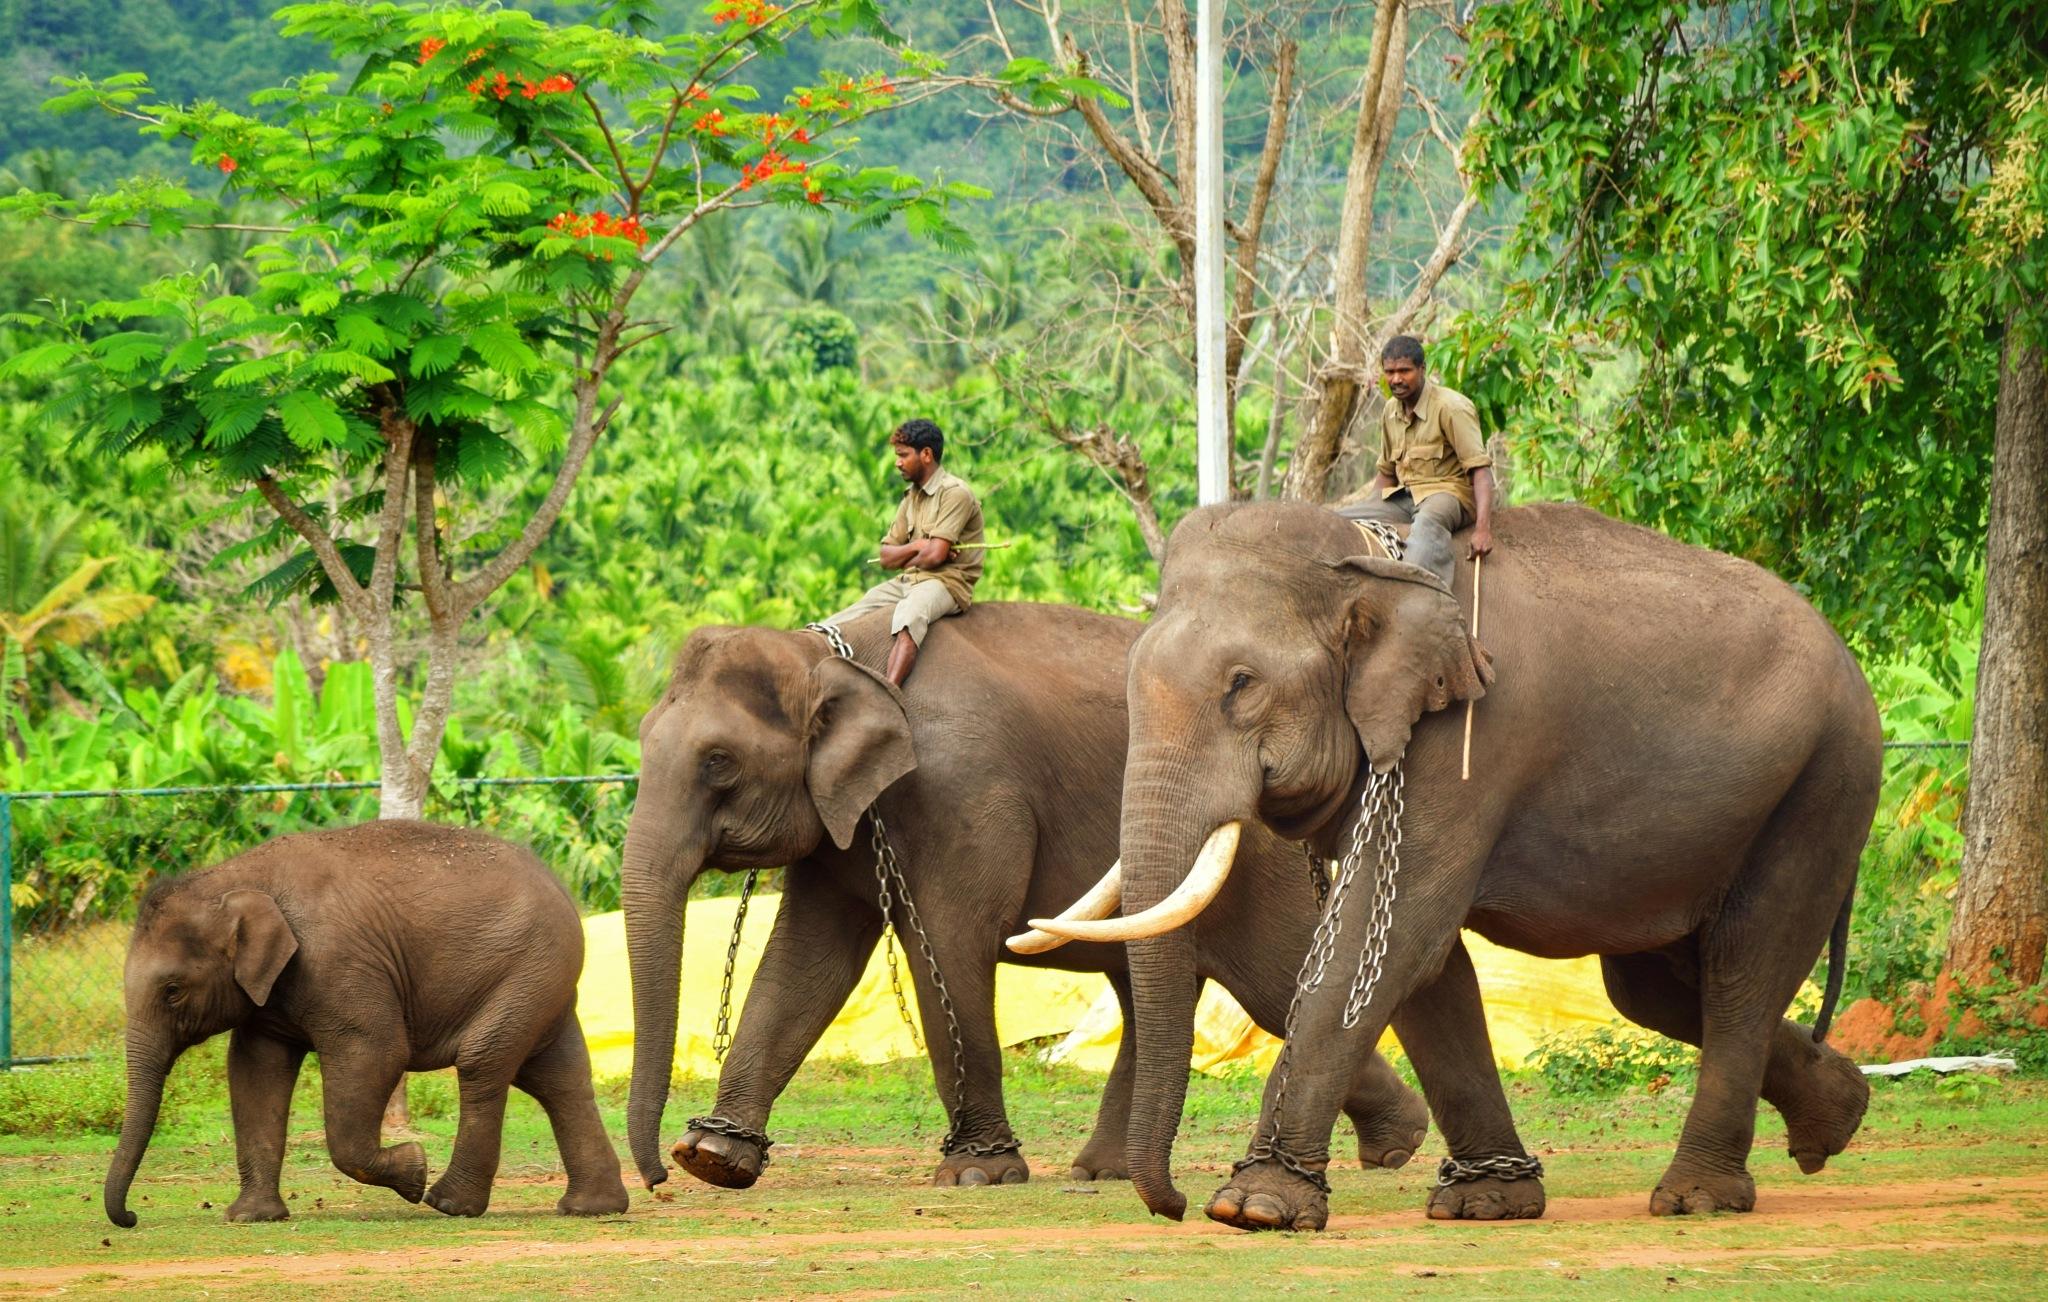 Elephant Family. by pratham7721